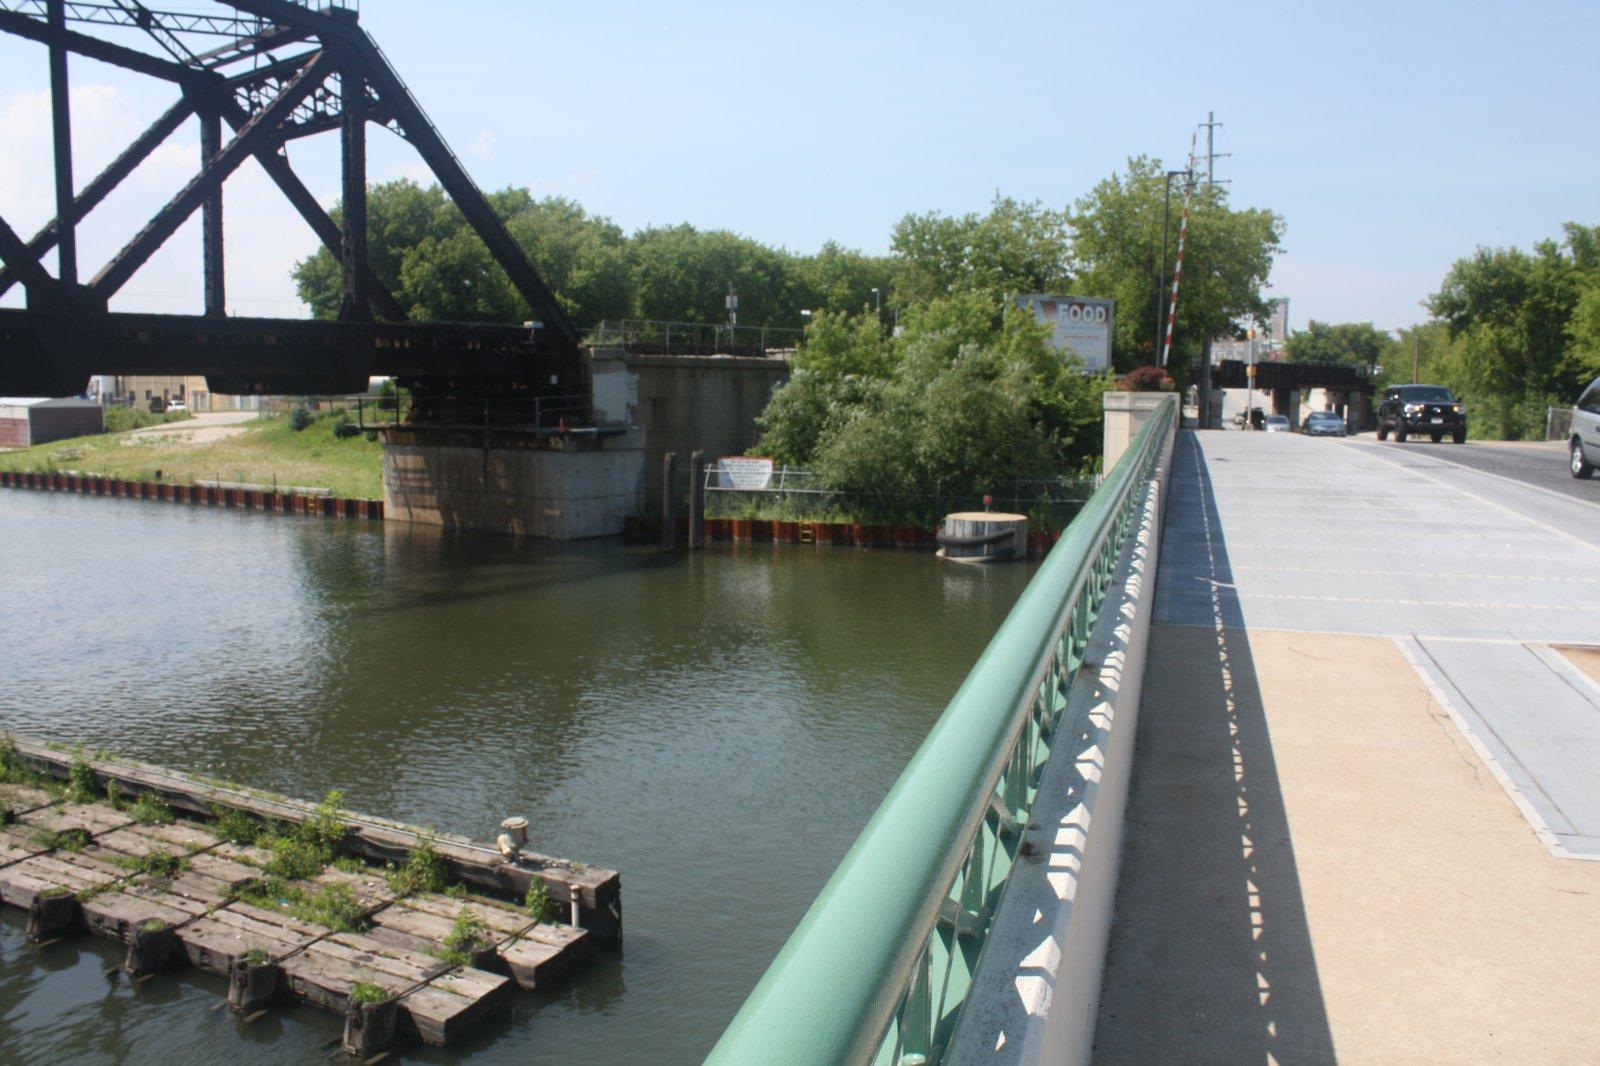 Kinnickinnic River bridges. Photo by Carl Baehr.